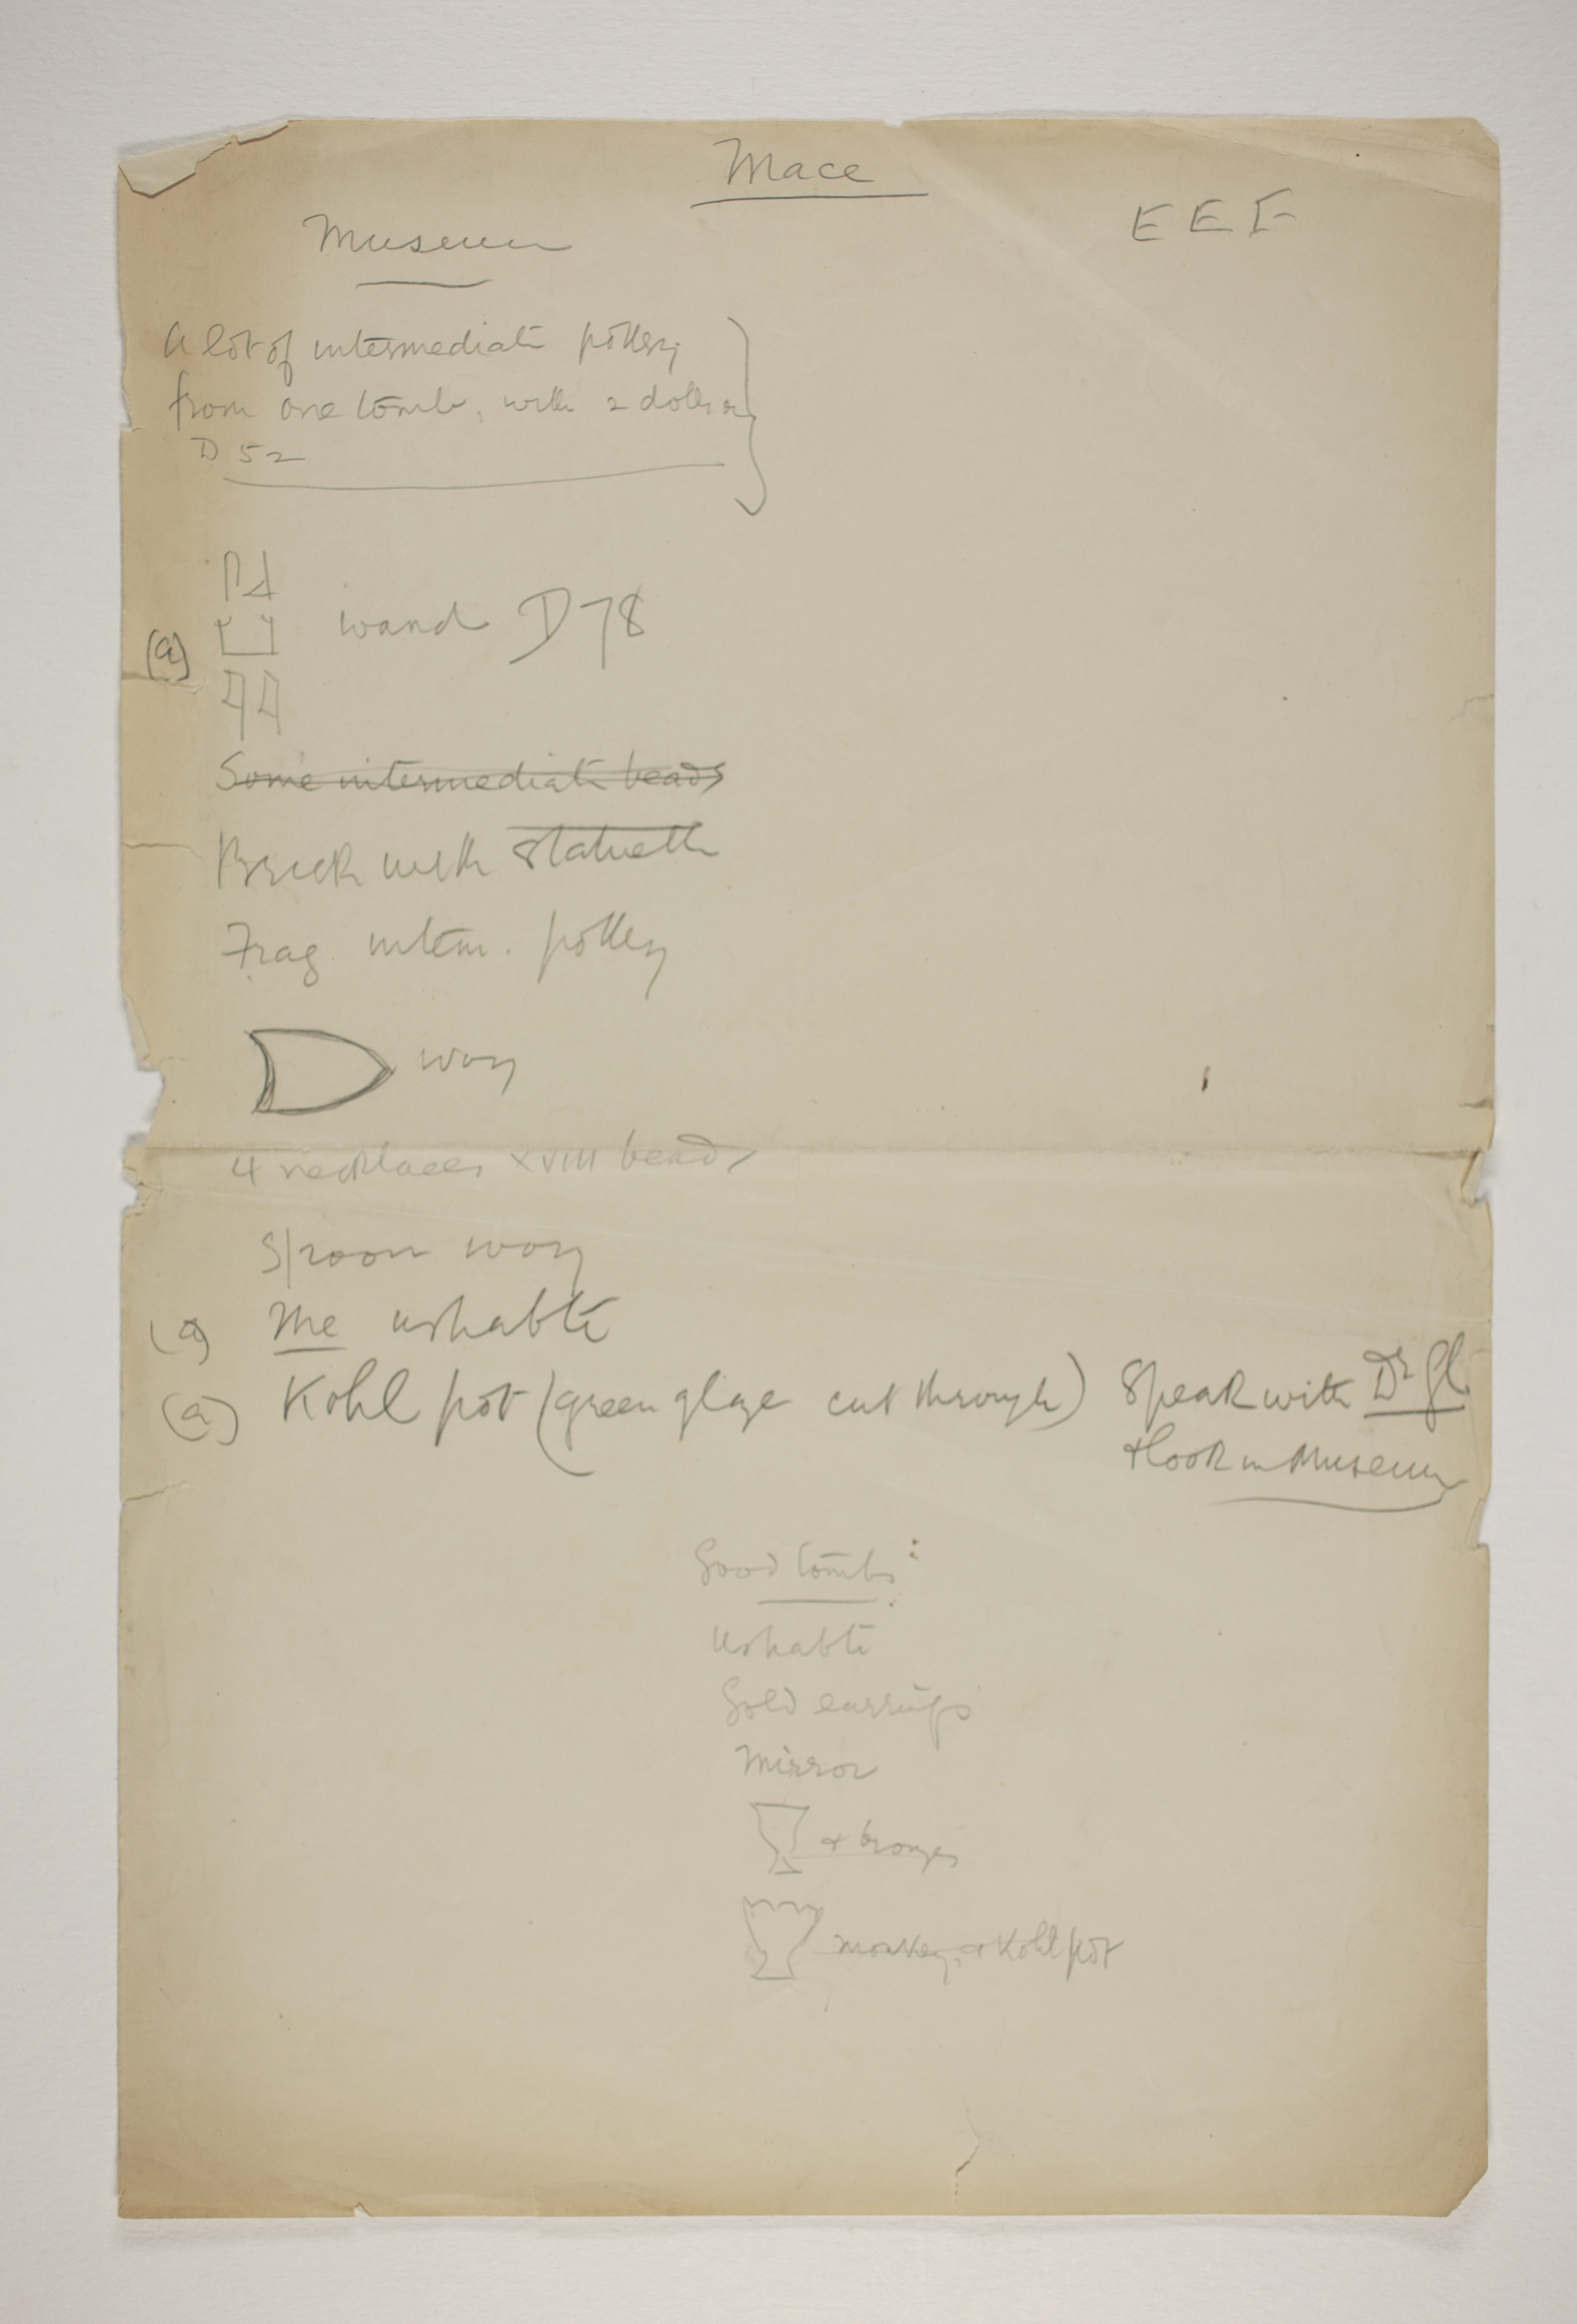 1900-01 Abydos, Bet Khallaf, el-Mahasna Distribution list PMA/WFP1/D/9/21.1